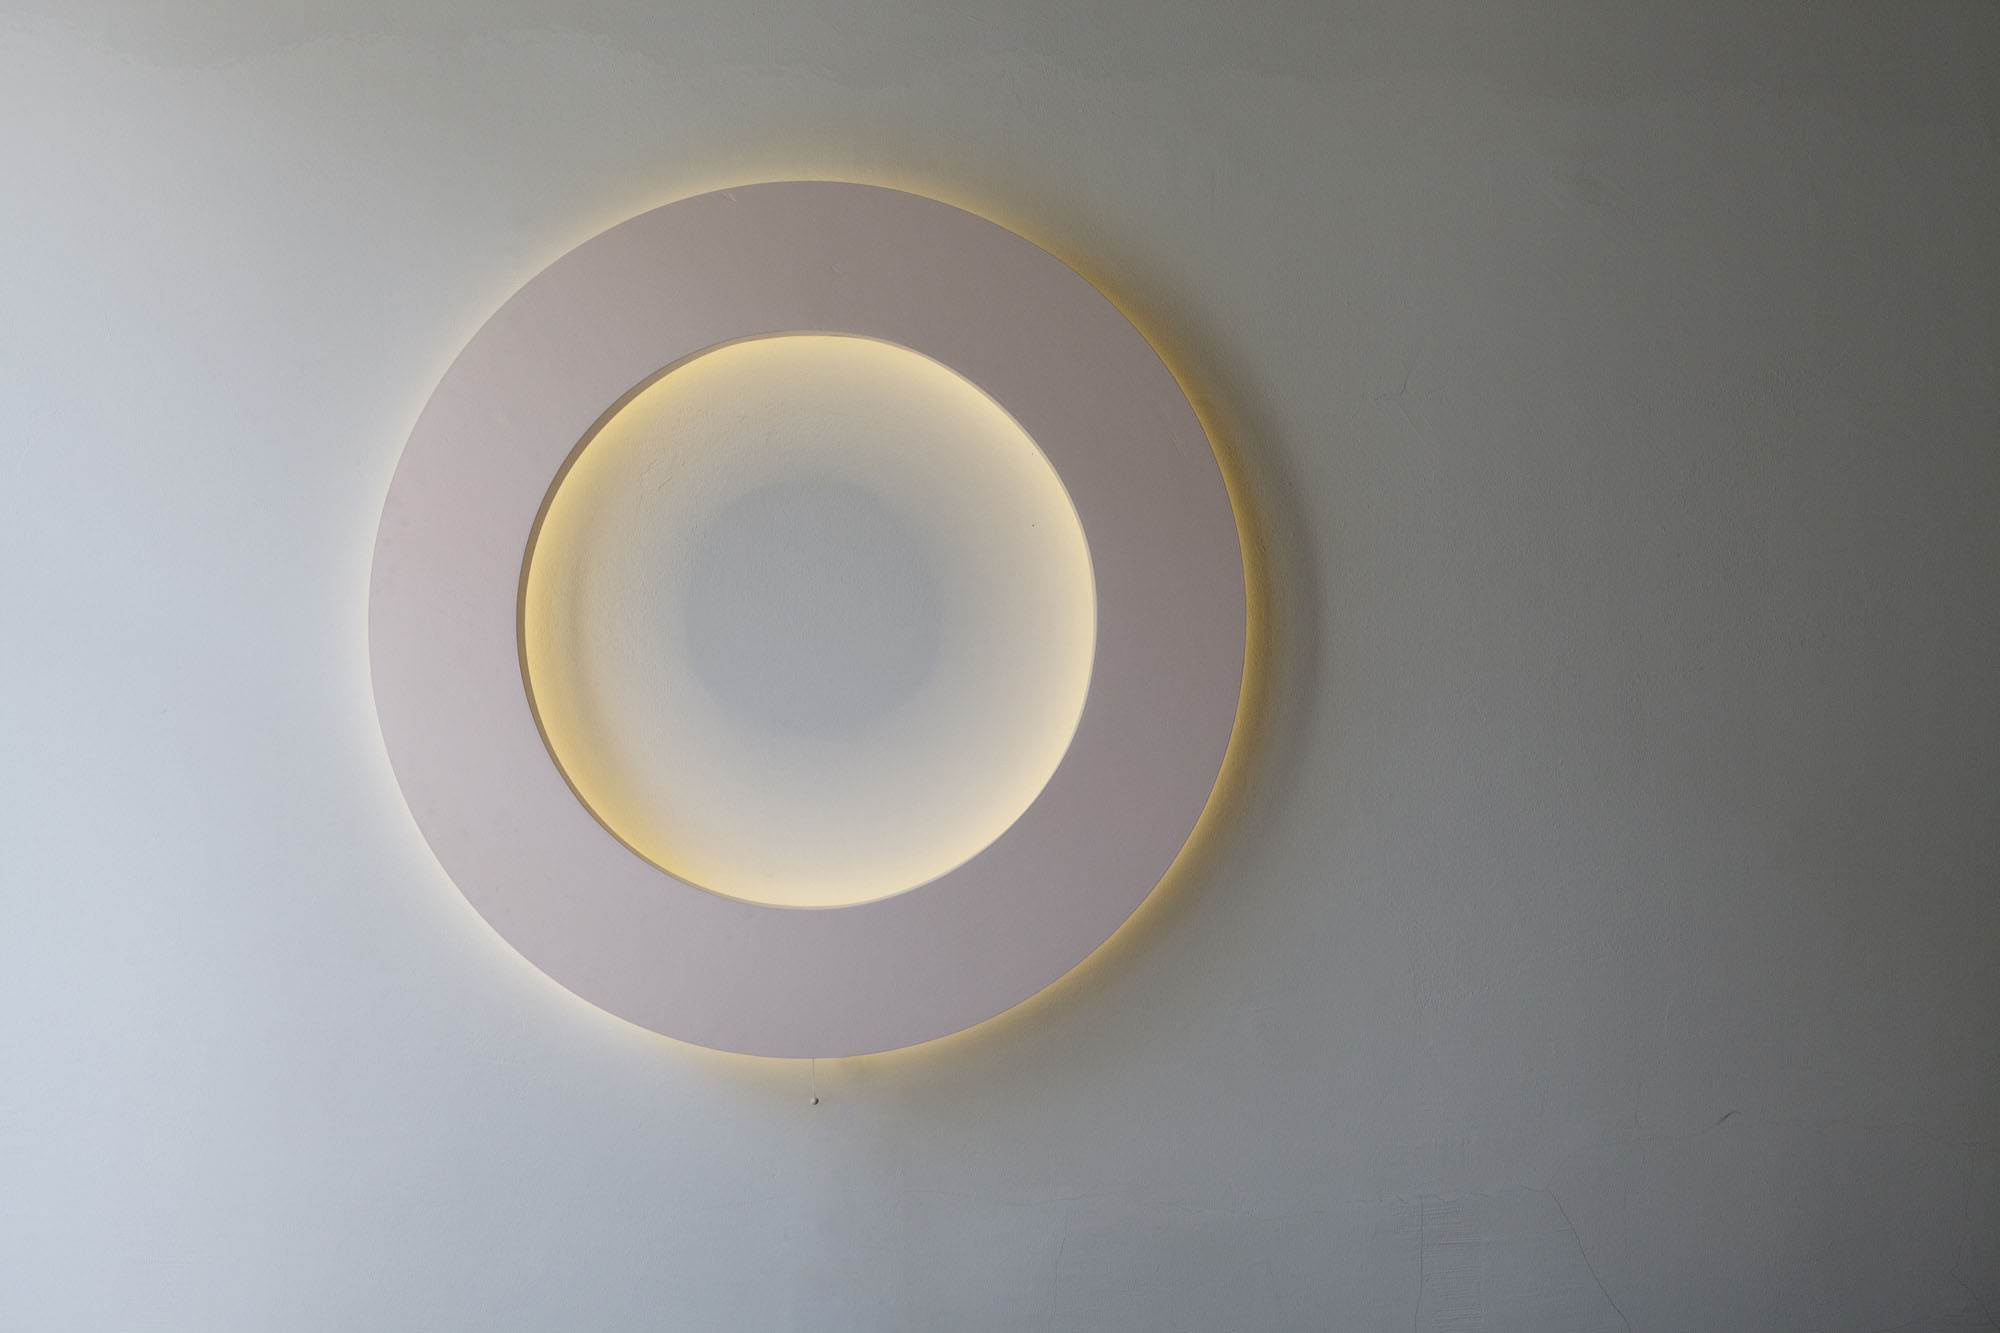 WALL LIGHT CONTOUR  LED, CUSTOMIZE COLOUR AND SIZE,  FARROW & BALL CALAMINE AND DIAMETER 120CM STANDARD